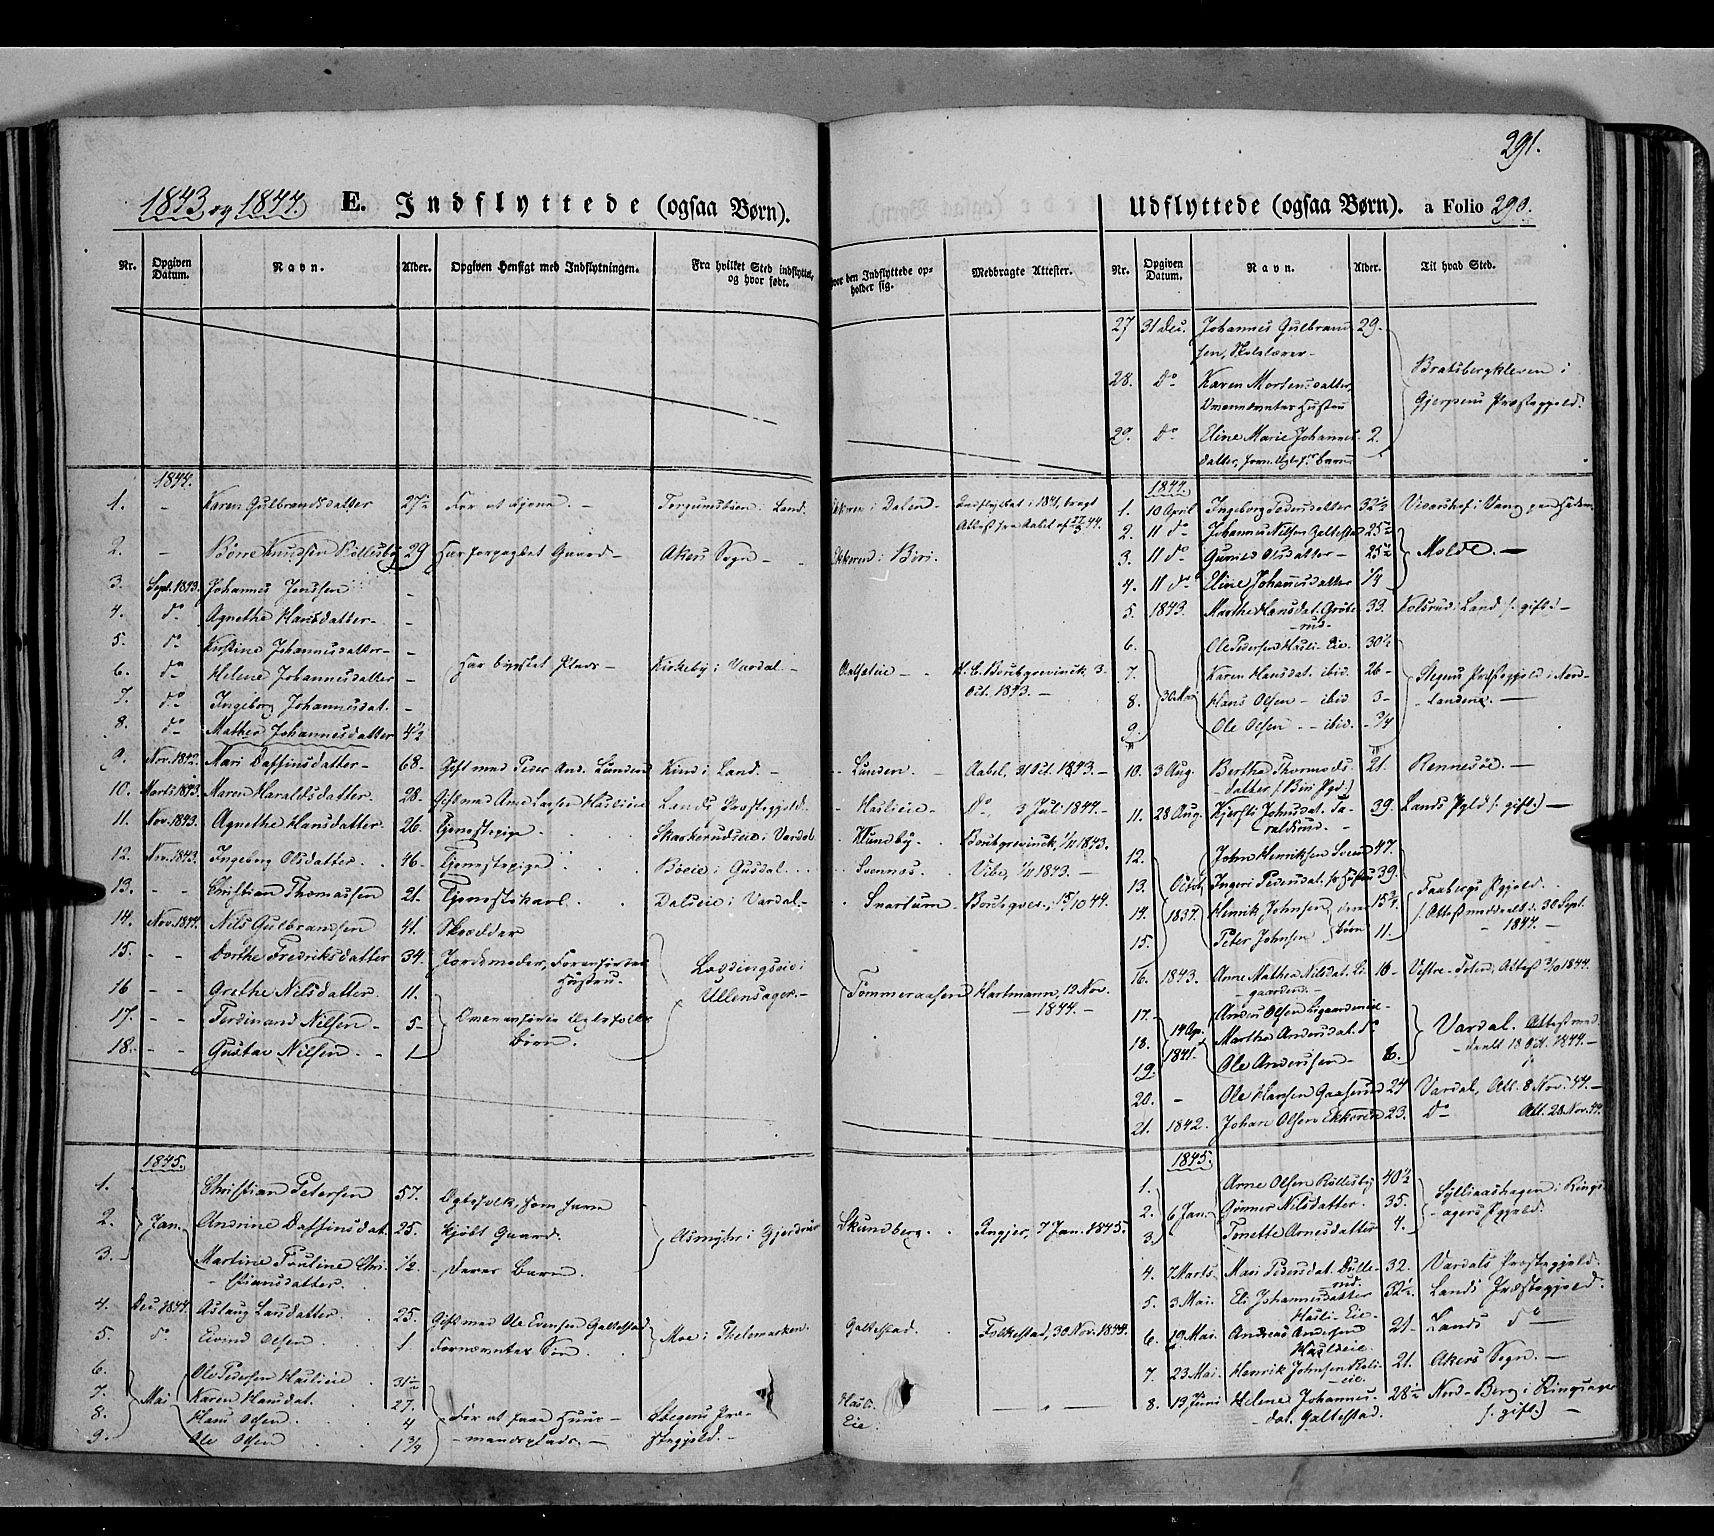 SAH, Biri prestekontor, Ministerialbok nr. 5, 1843-1854, s. 291